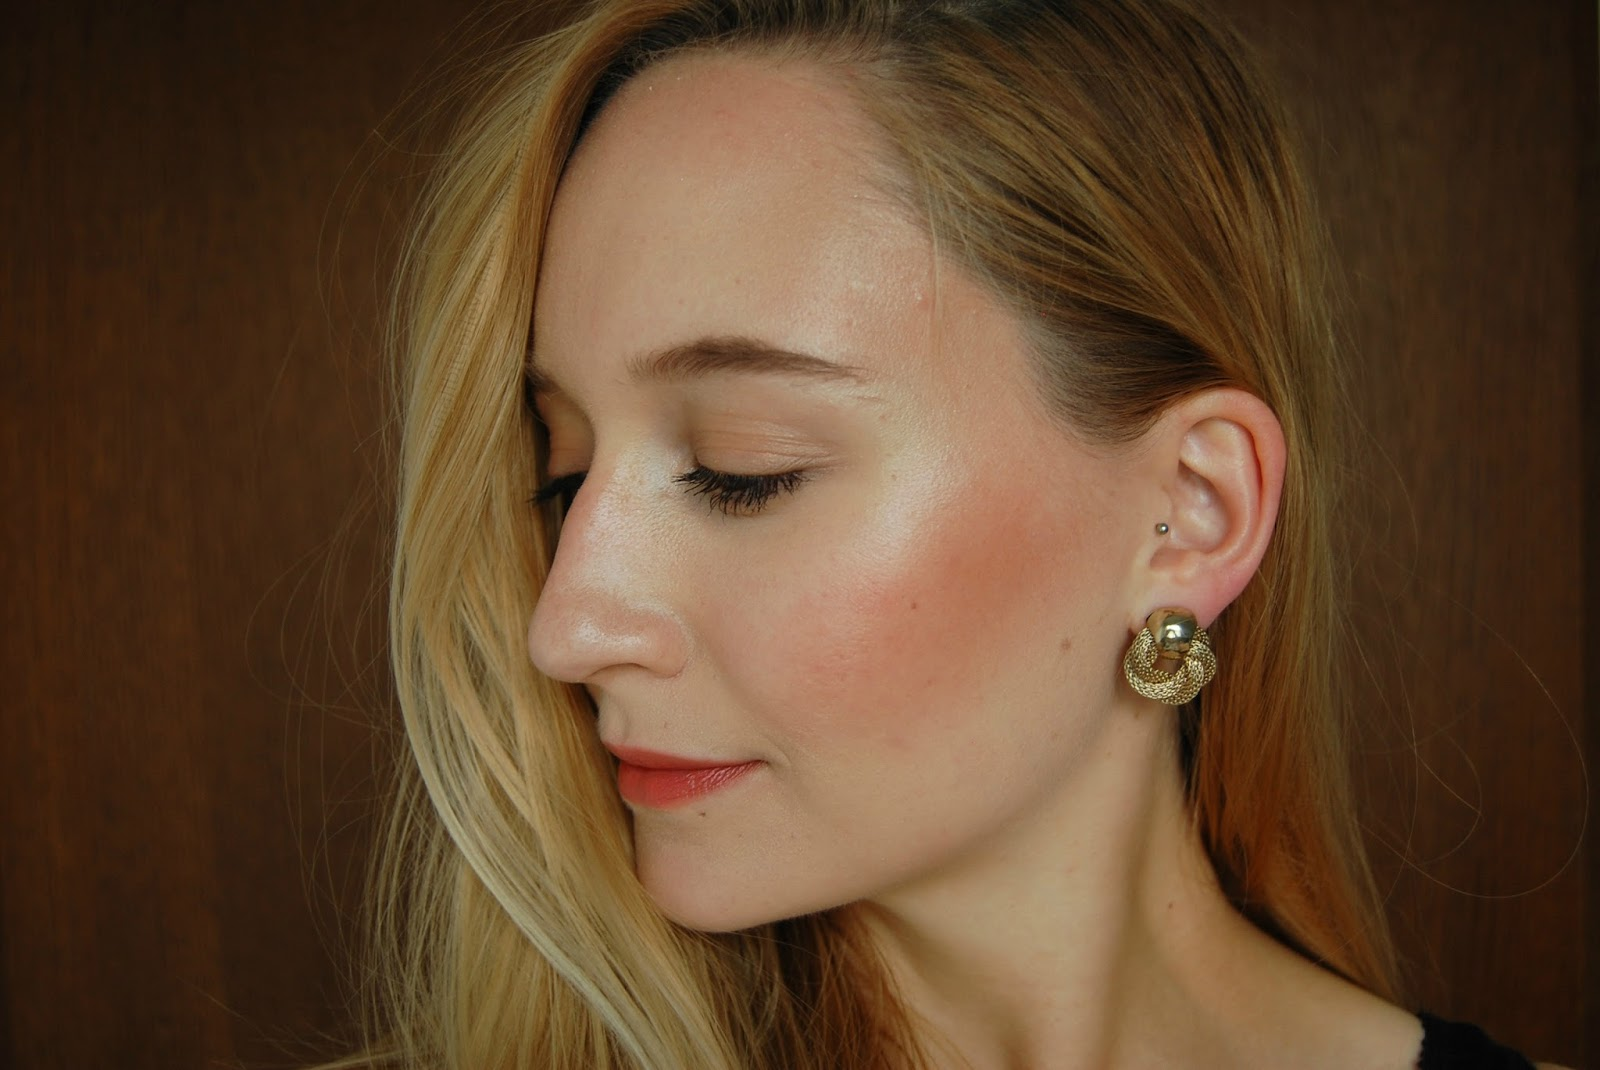 Delizioso Skincare Tara Collection Bronzing Mousse, Glow Creme Luminizer